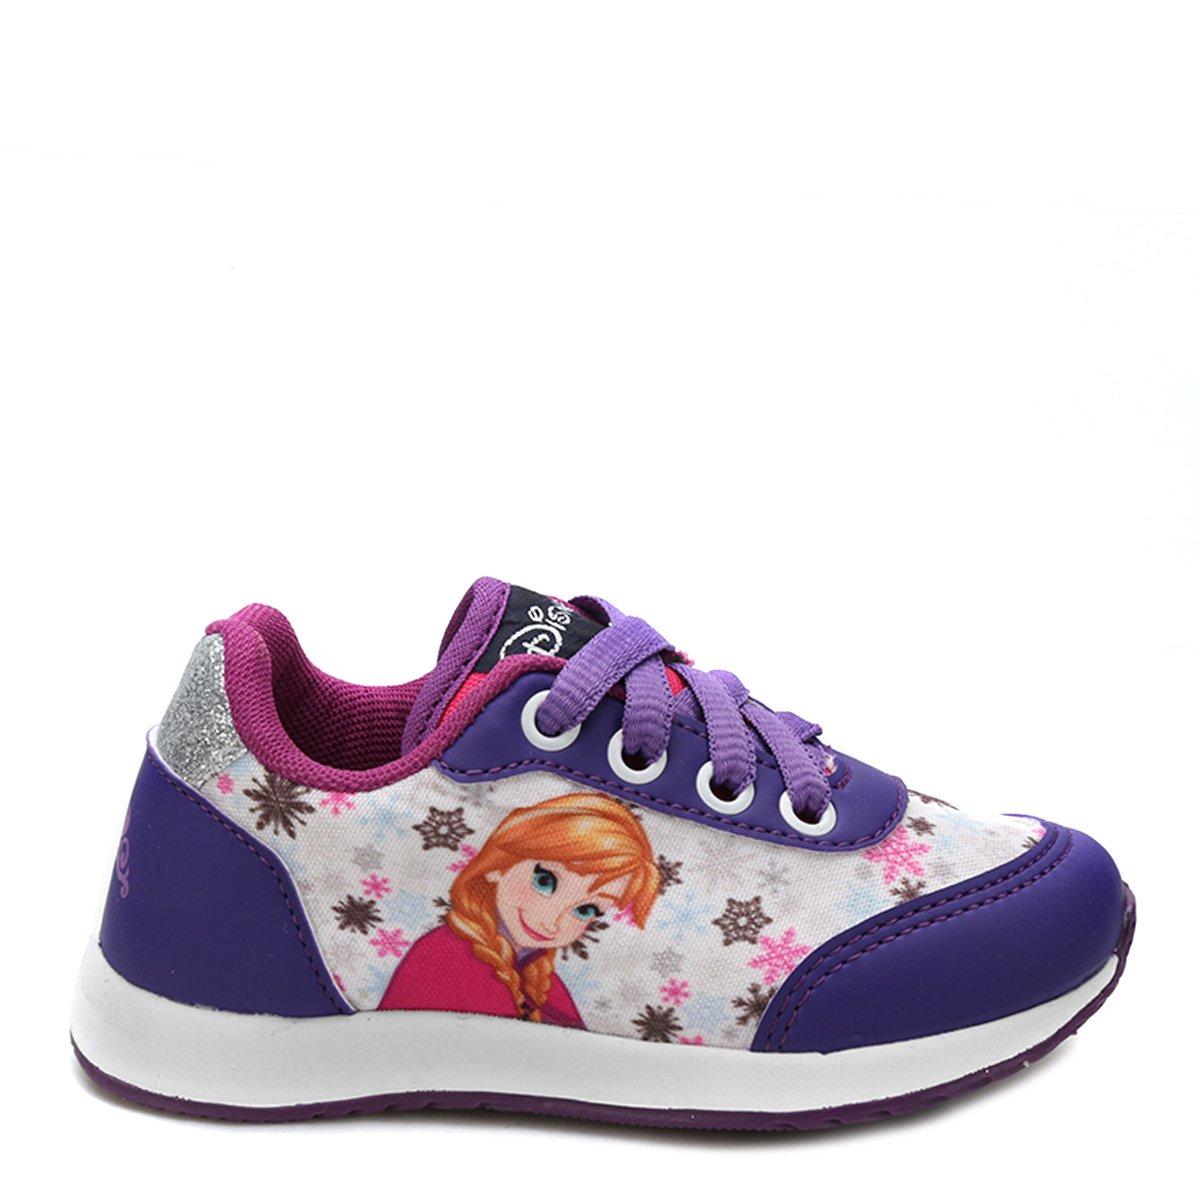 80eee3846f Tênis Infantil Disney Frozen Feminino